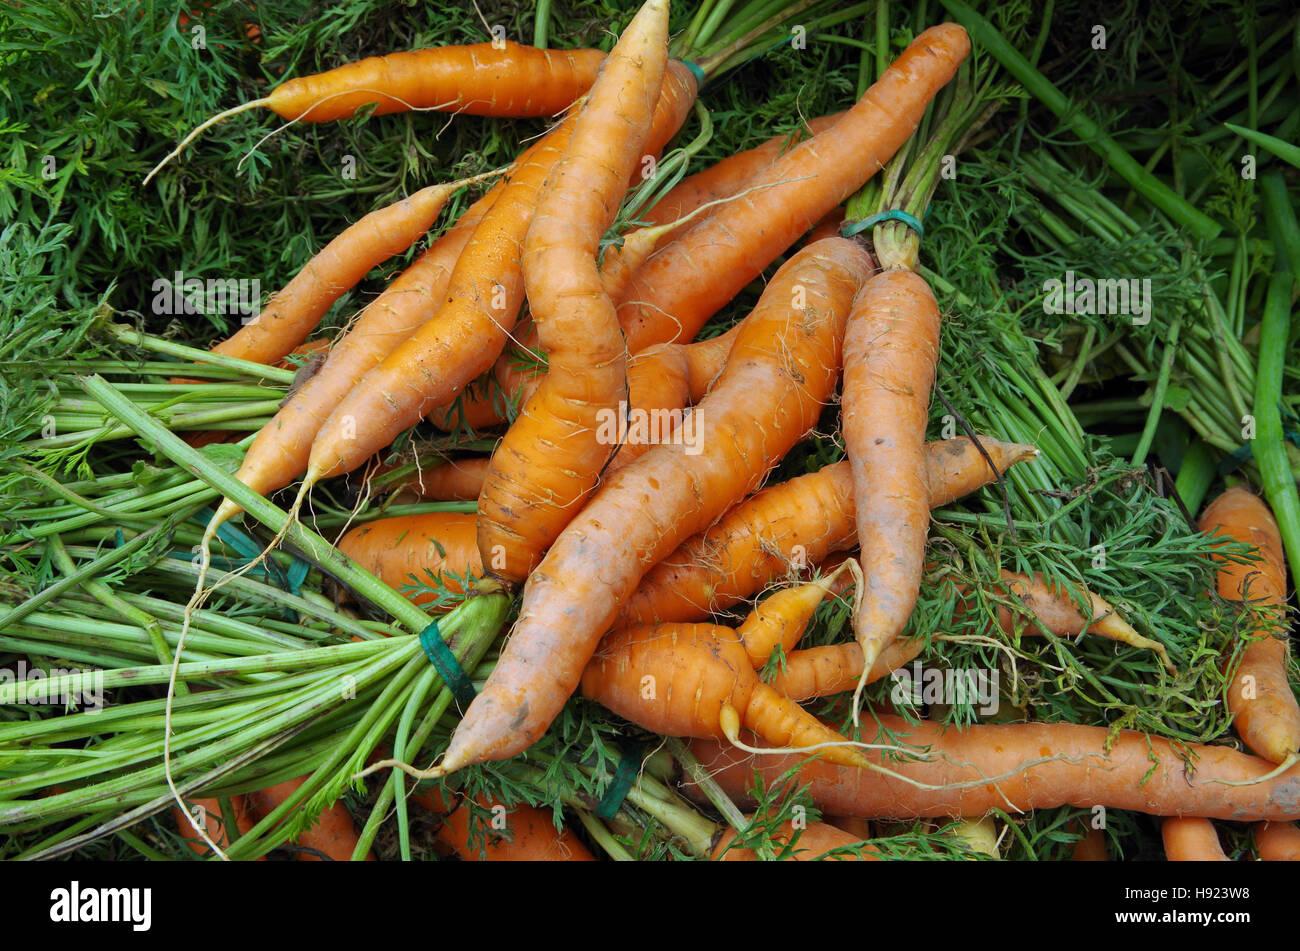 Farm fresh shapely carrots and carrot tops - Stock Image